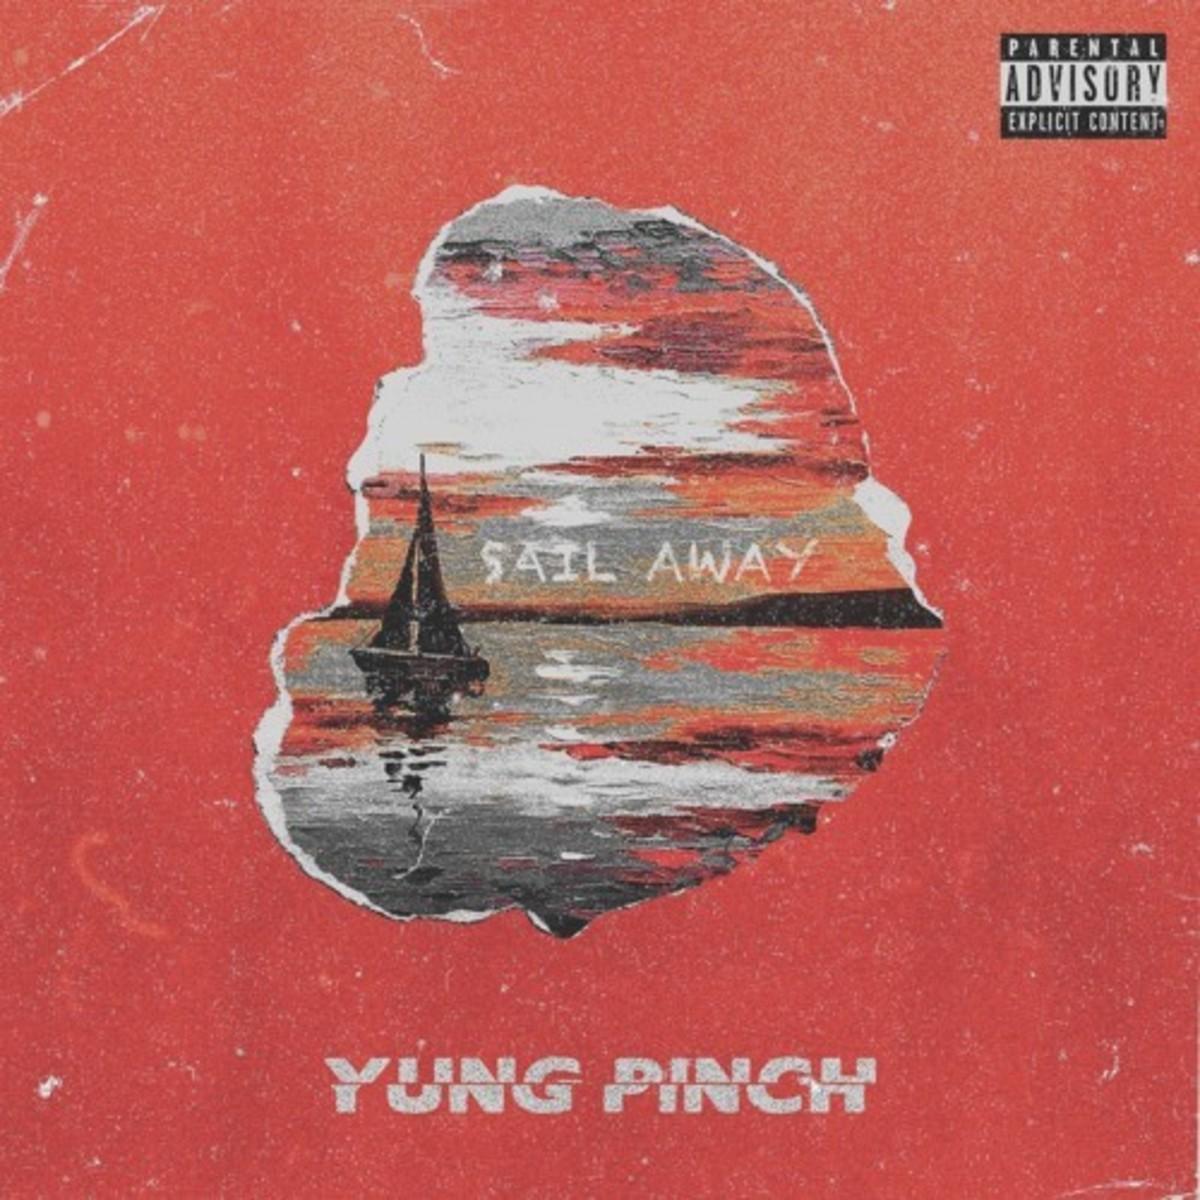 yung-pinch-sail-away.jpg